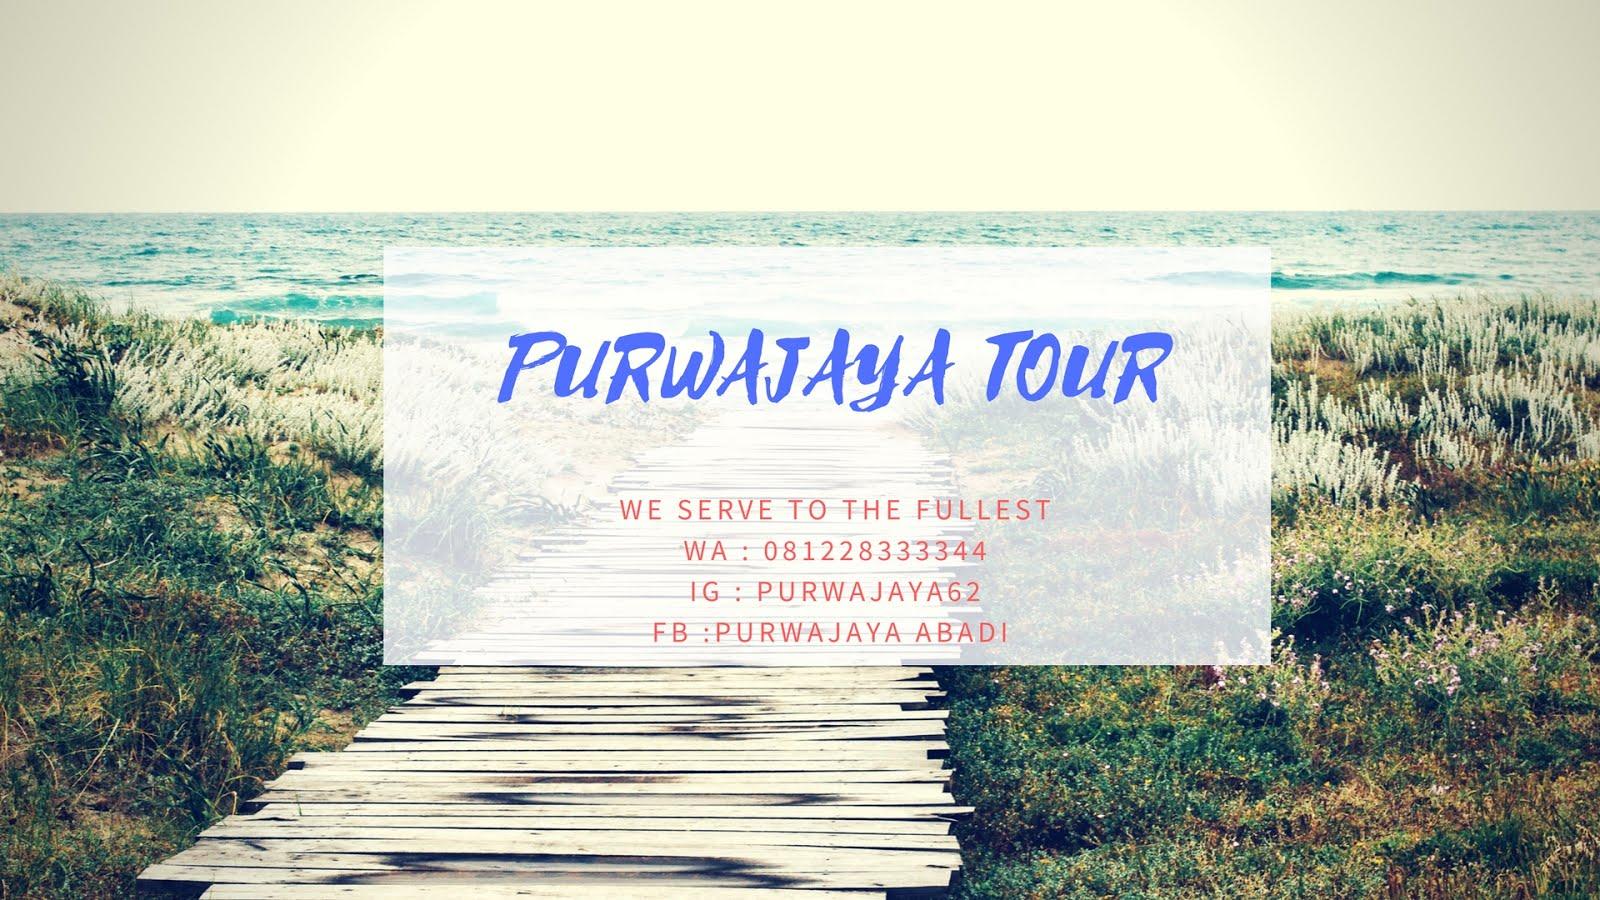 PURWAJAYA TOUR &  TRAVEL